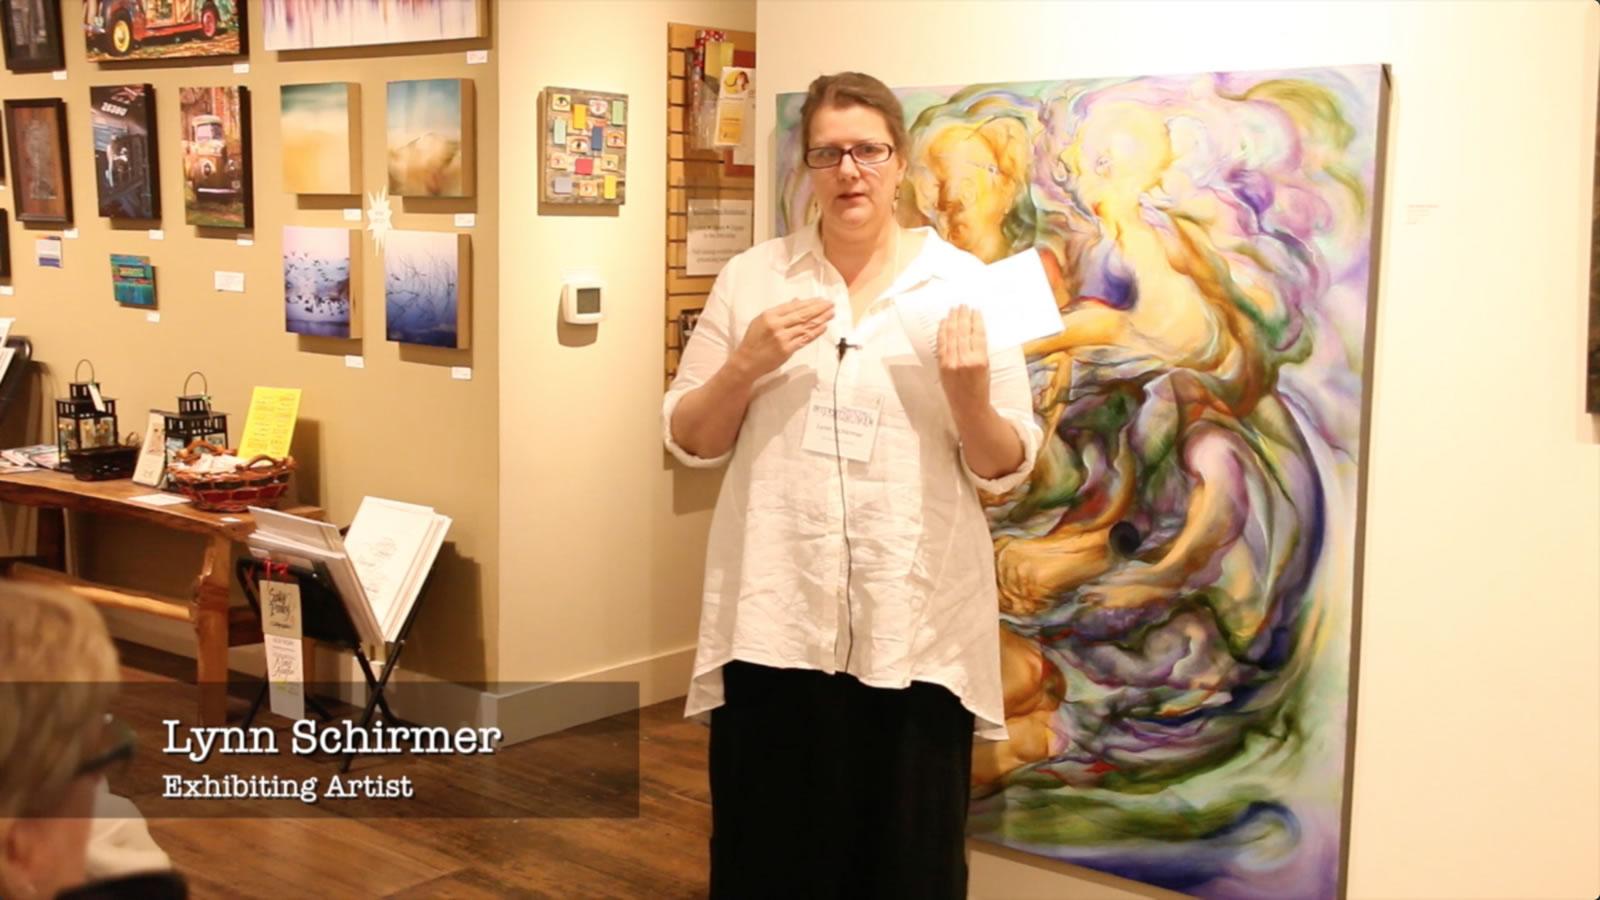 Incredible Intensity of Just Being Human - Lynn Schirmer